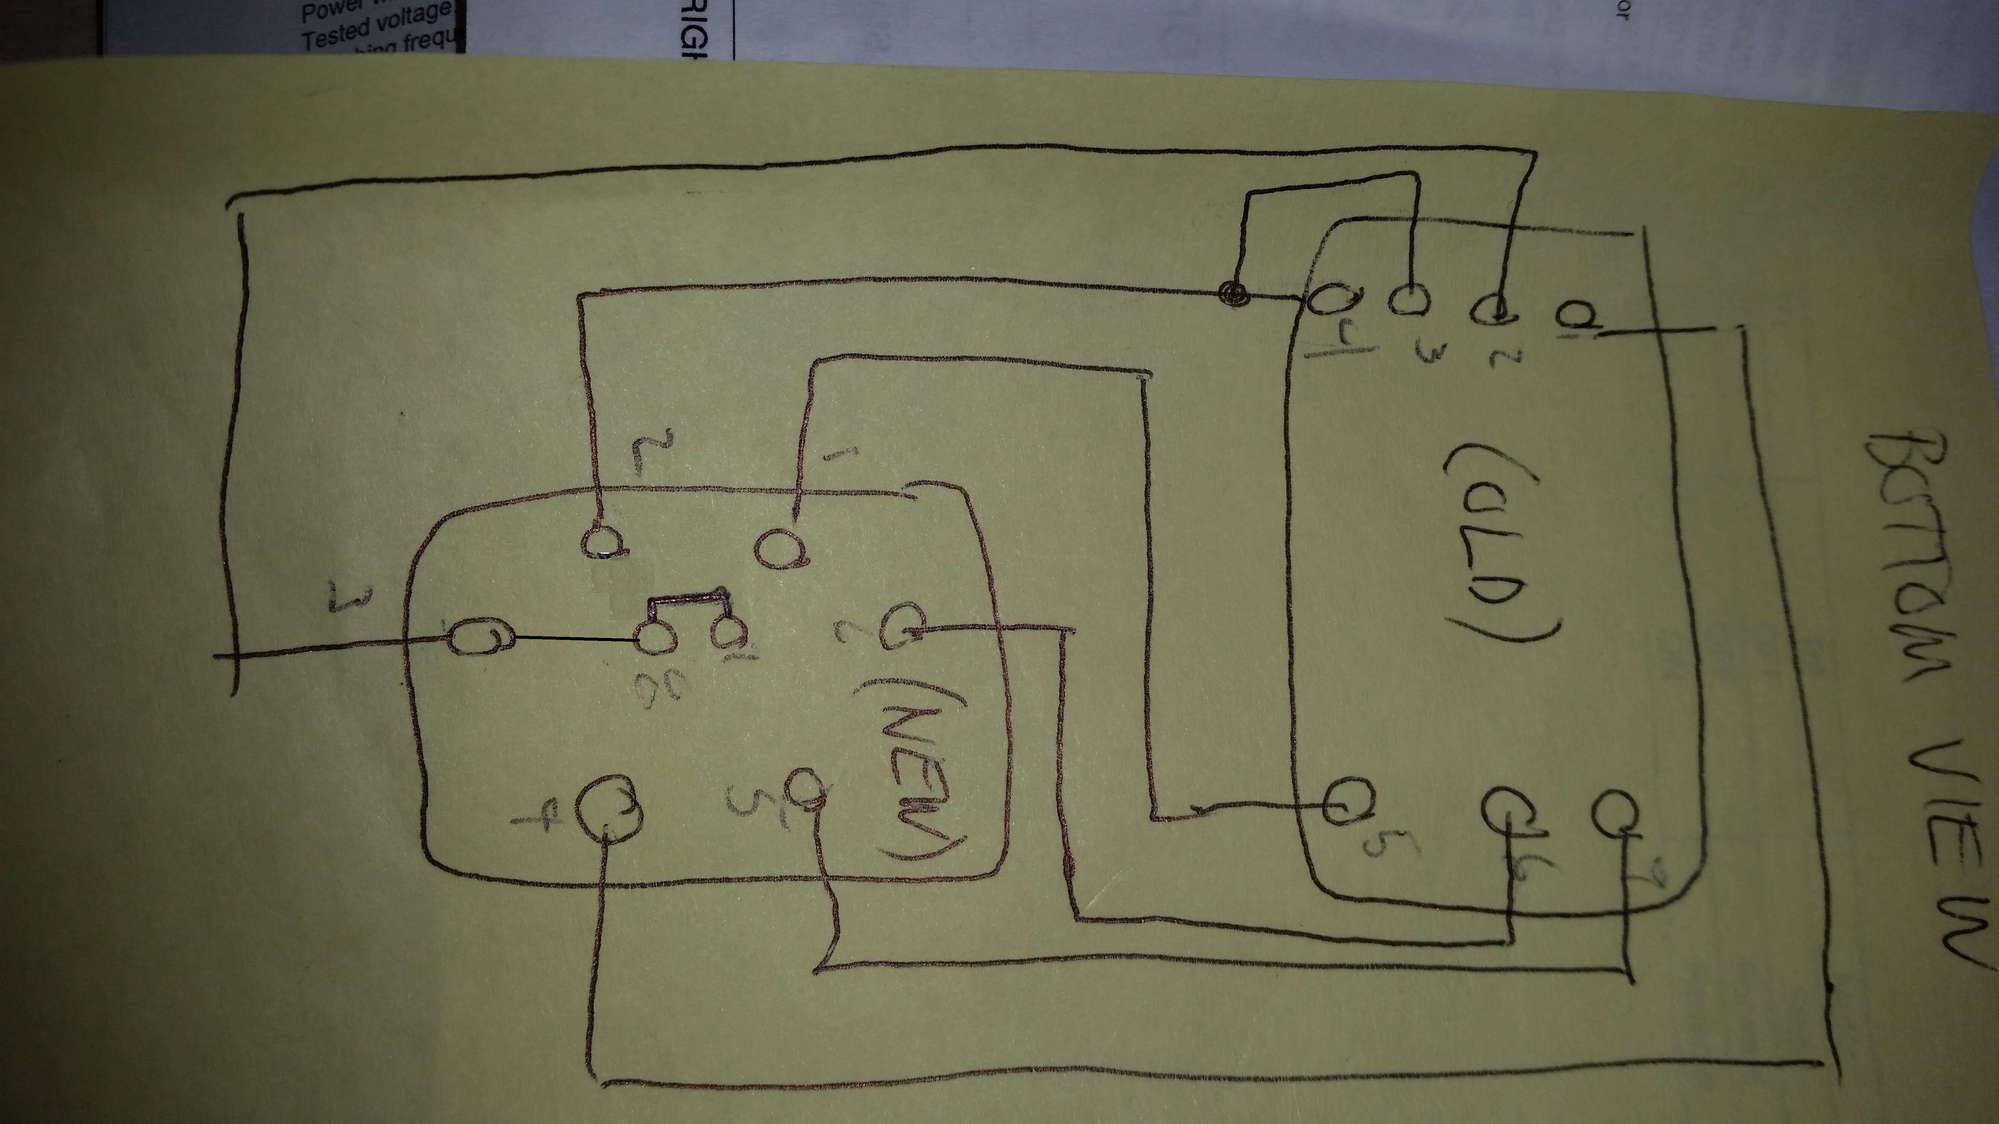 Window switch relay cr2 12v nais page 2 clublexus for 2001 lexus rx300 master window switch